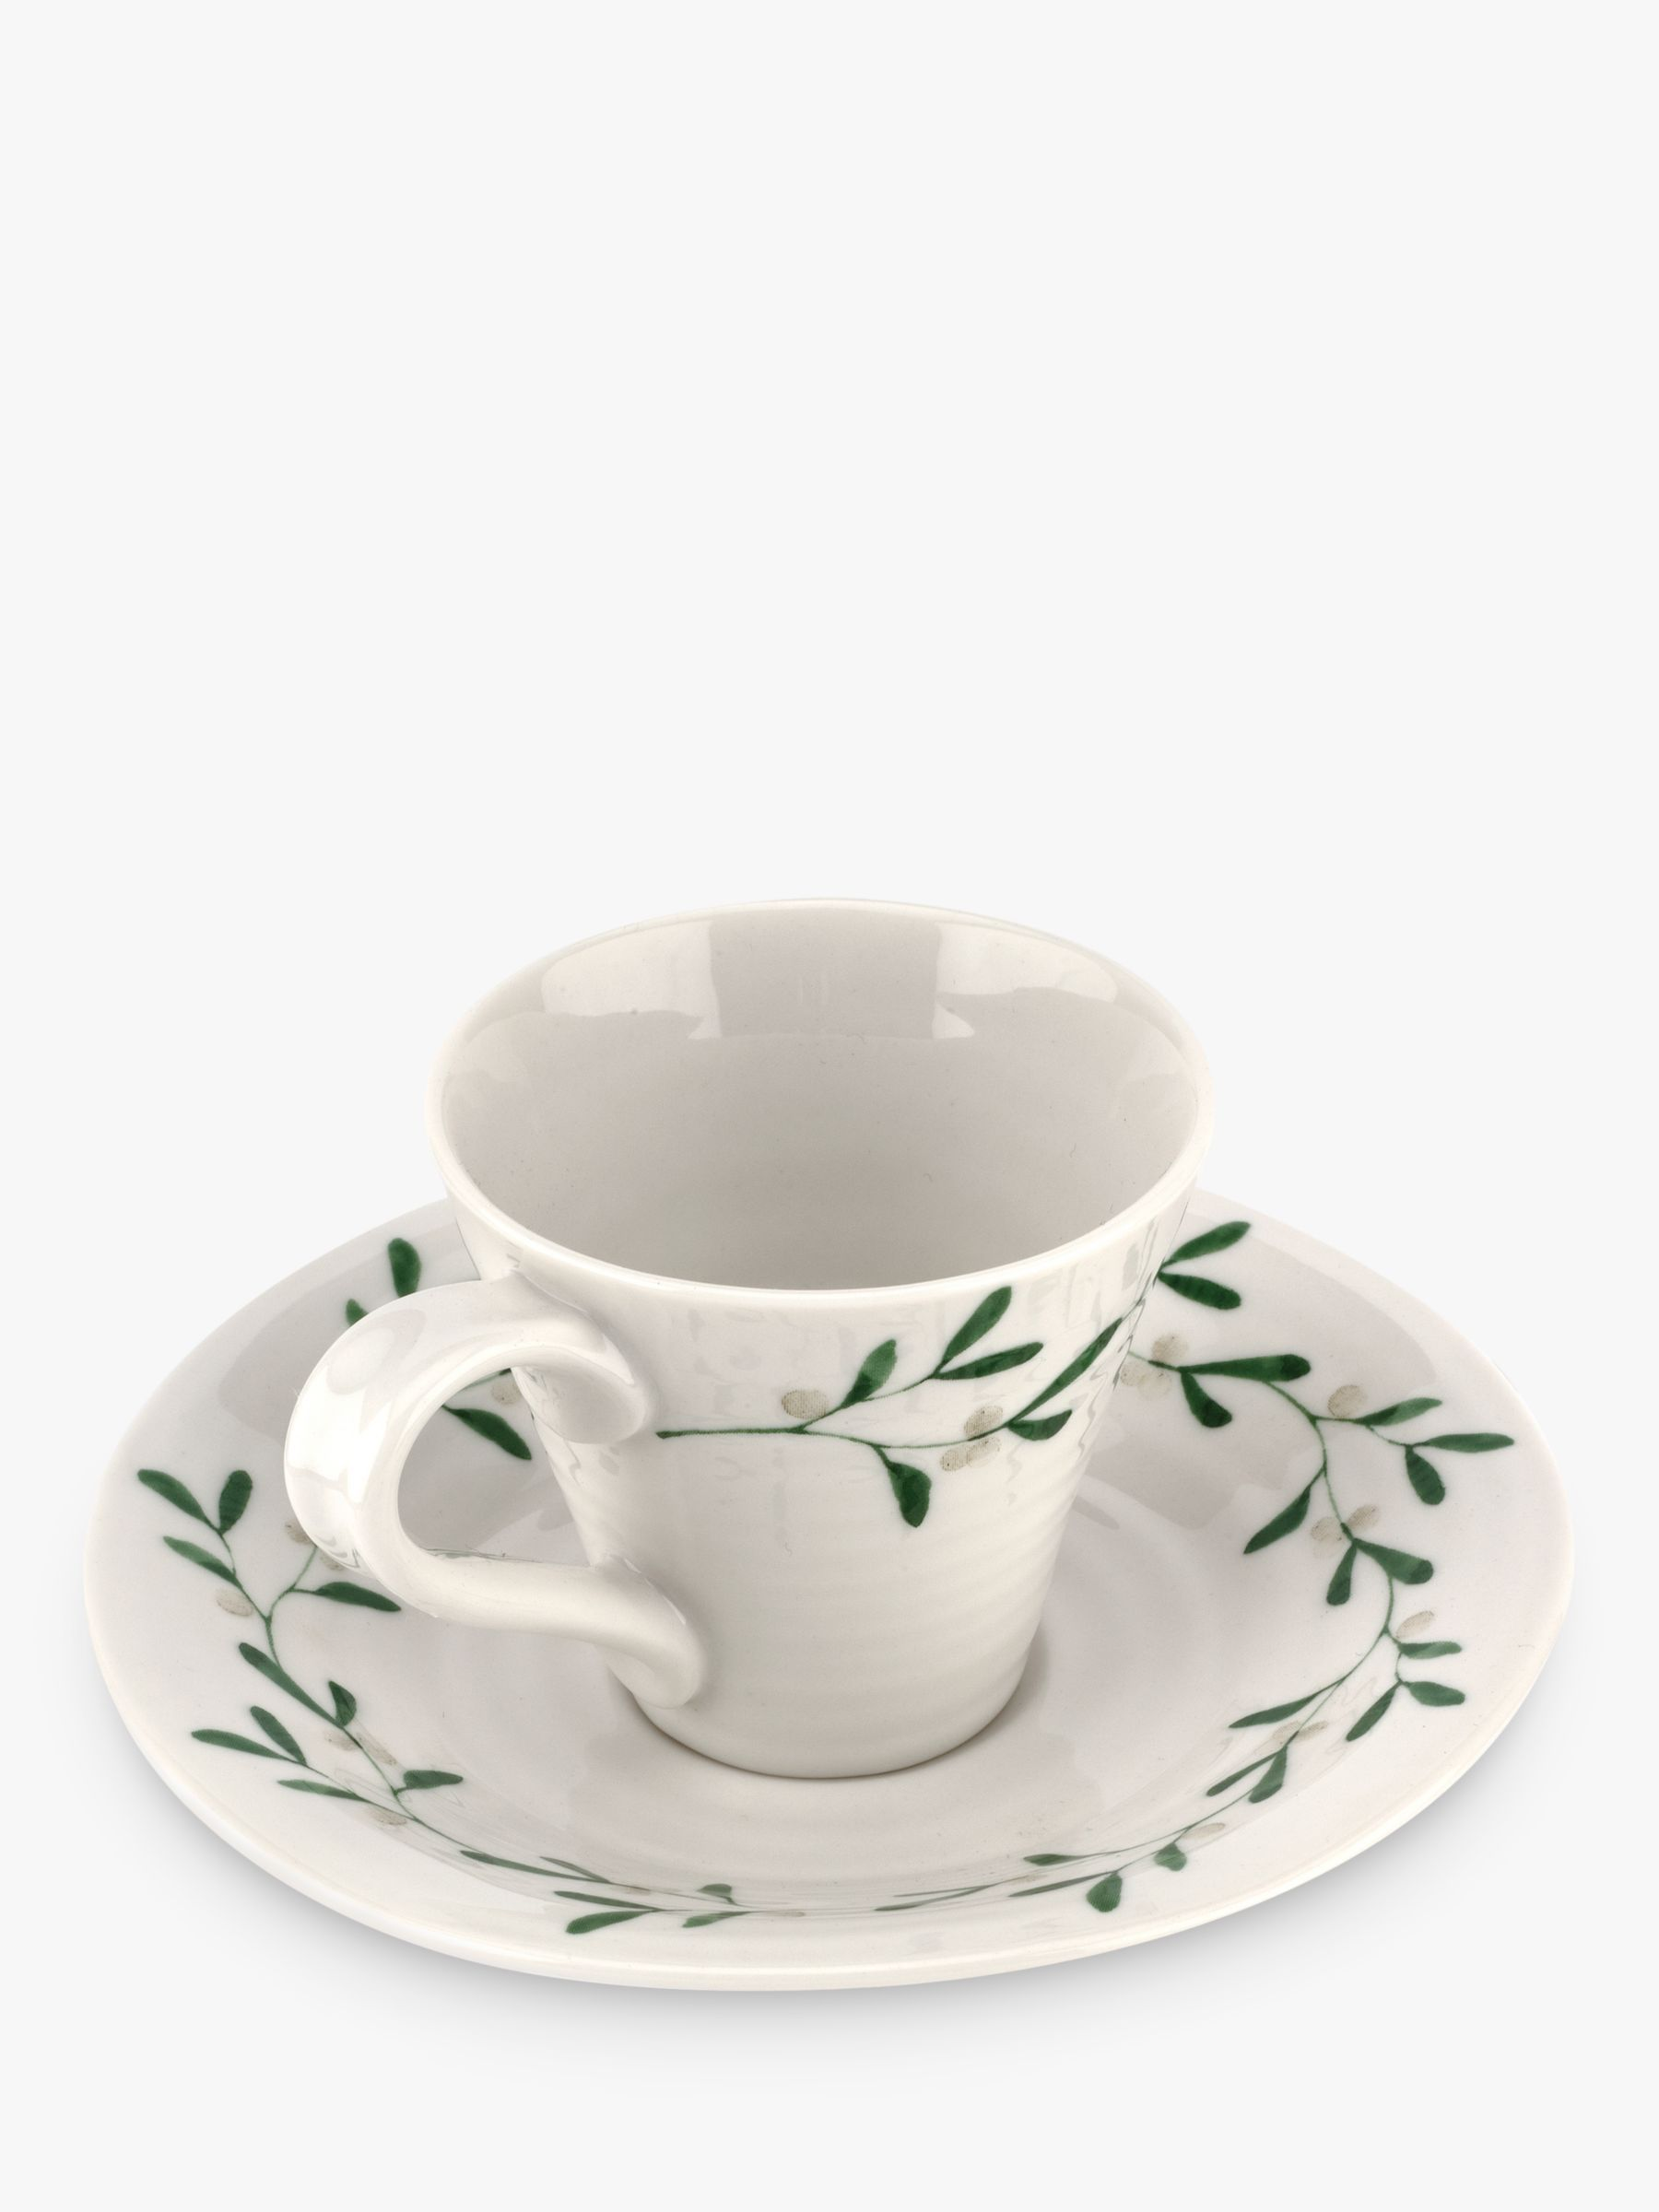 Portmeirion Sophie Conran Egg Cups S//2